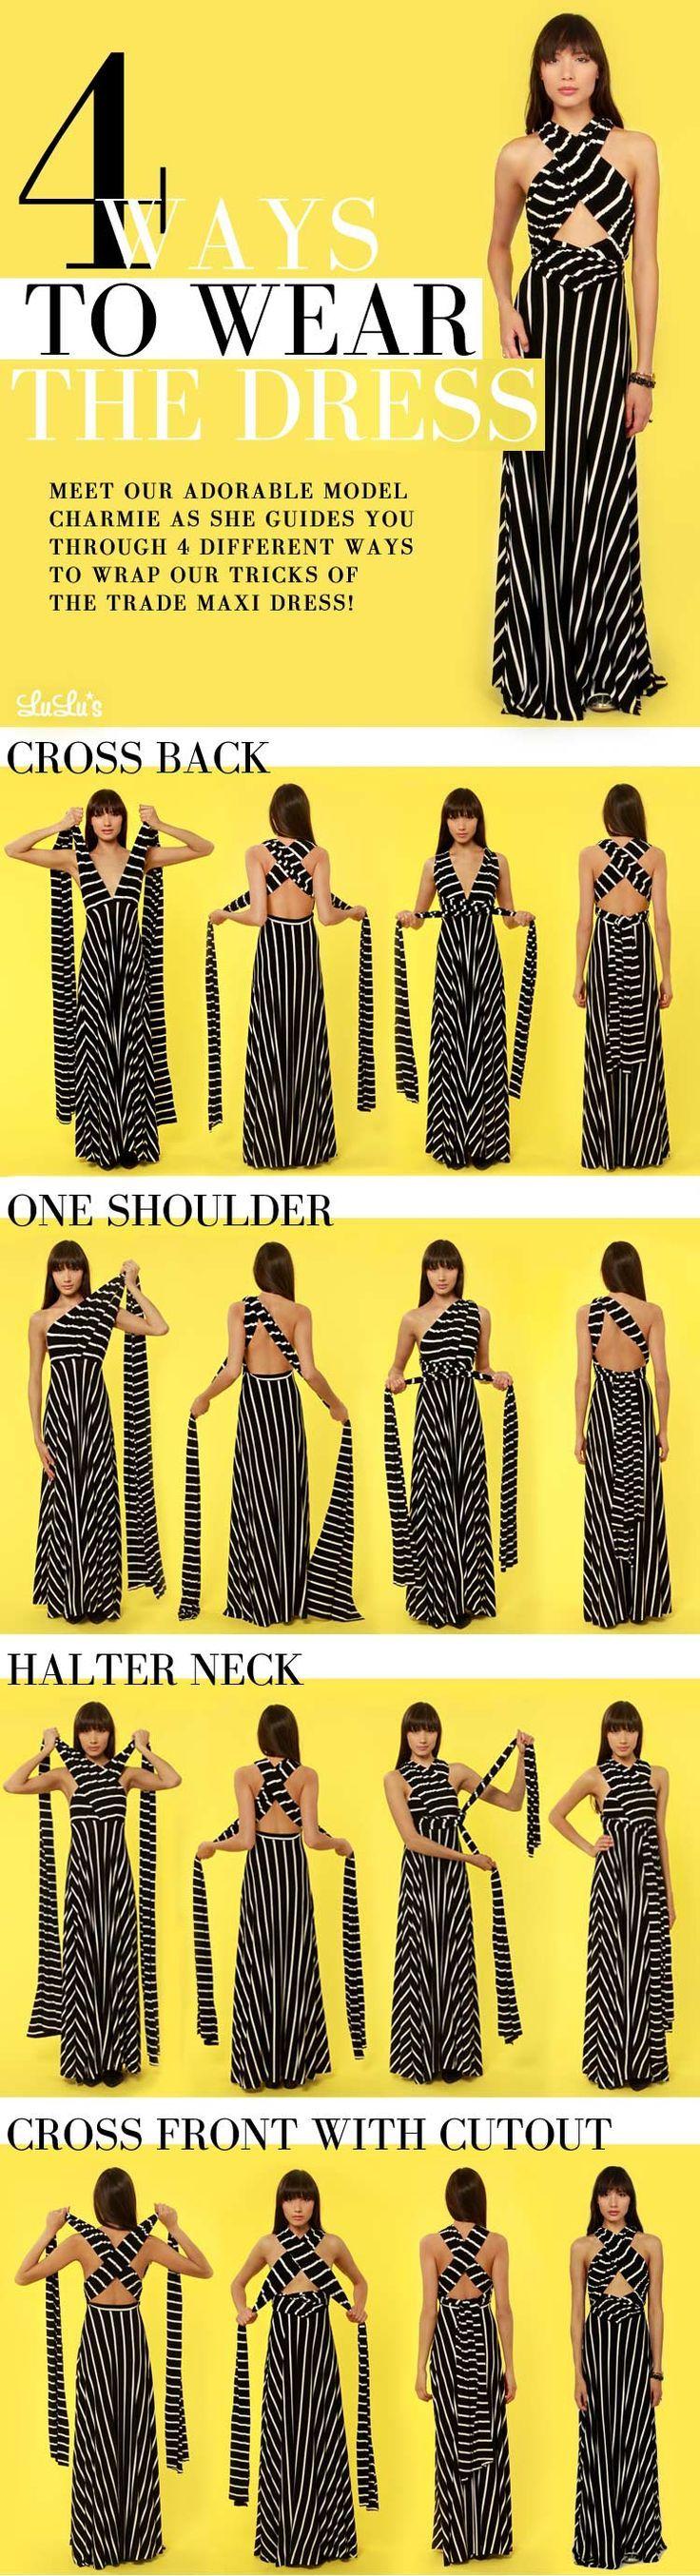 Convertible Wrap Dress | The Cutest Convertible Wrap Dress Tutorial! - http://Lulus.com Fashion Blog #flatlay #flatlays #flatlayapp www.theflatlay.com